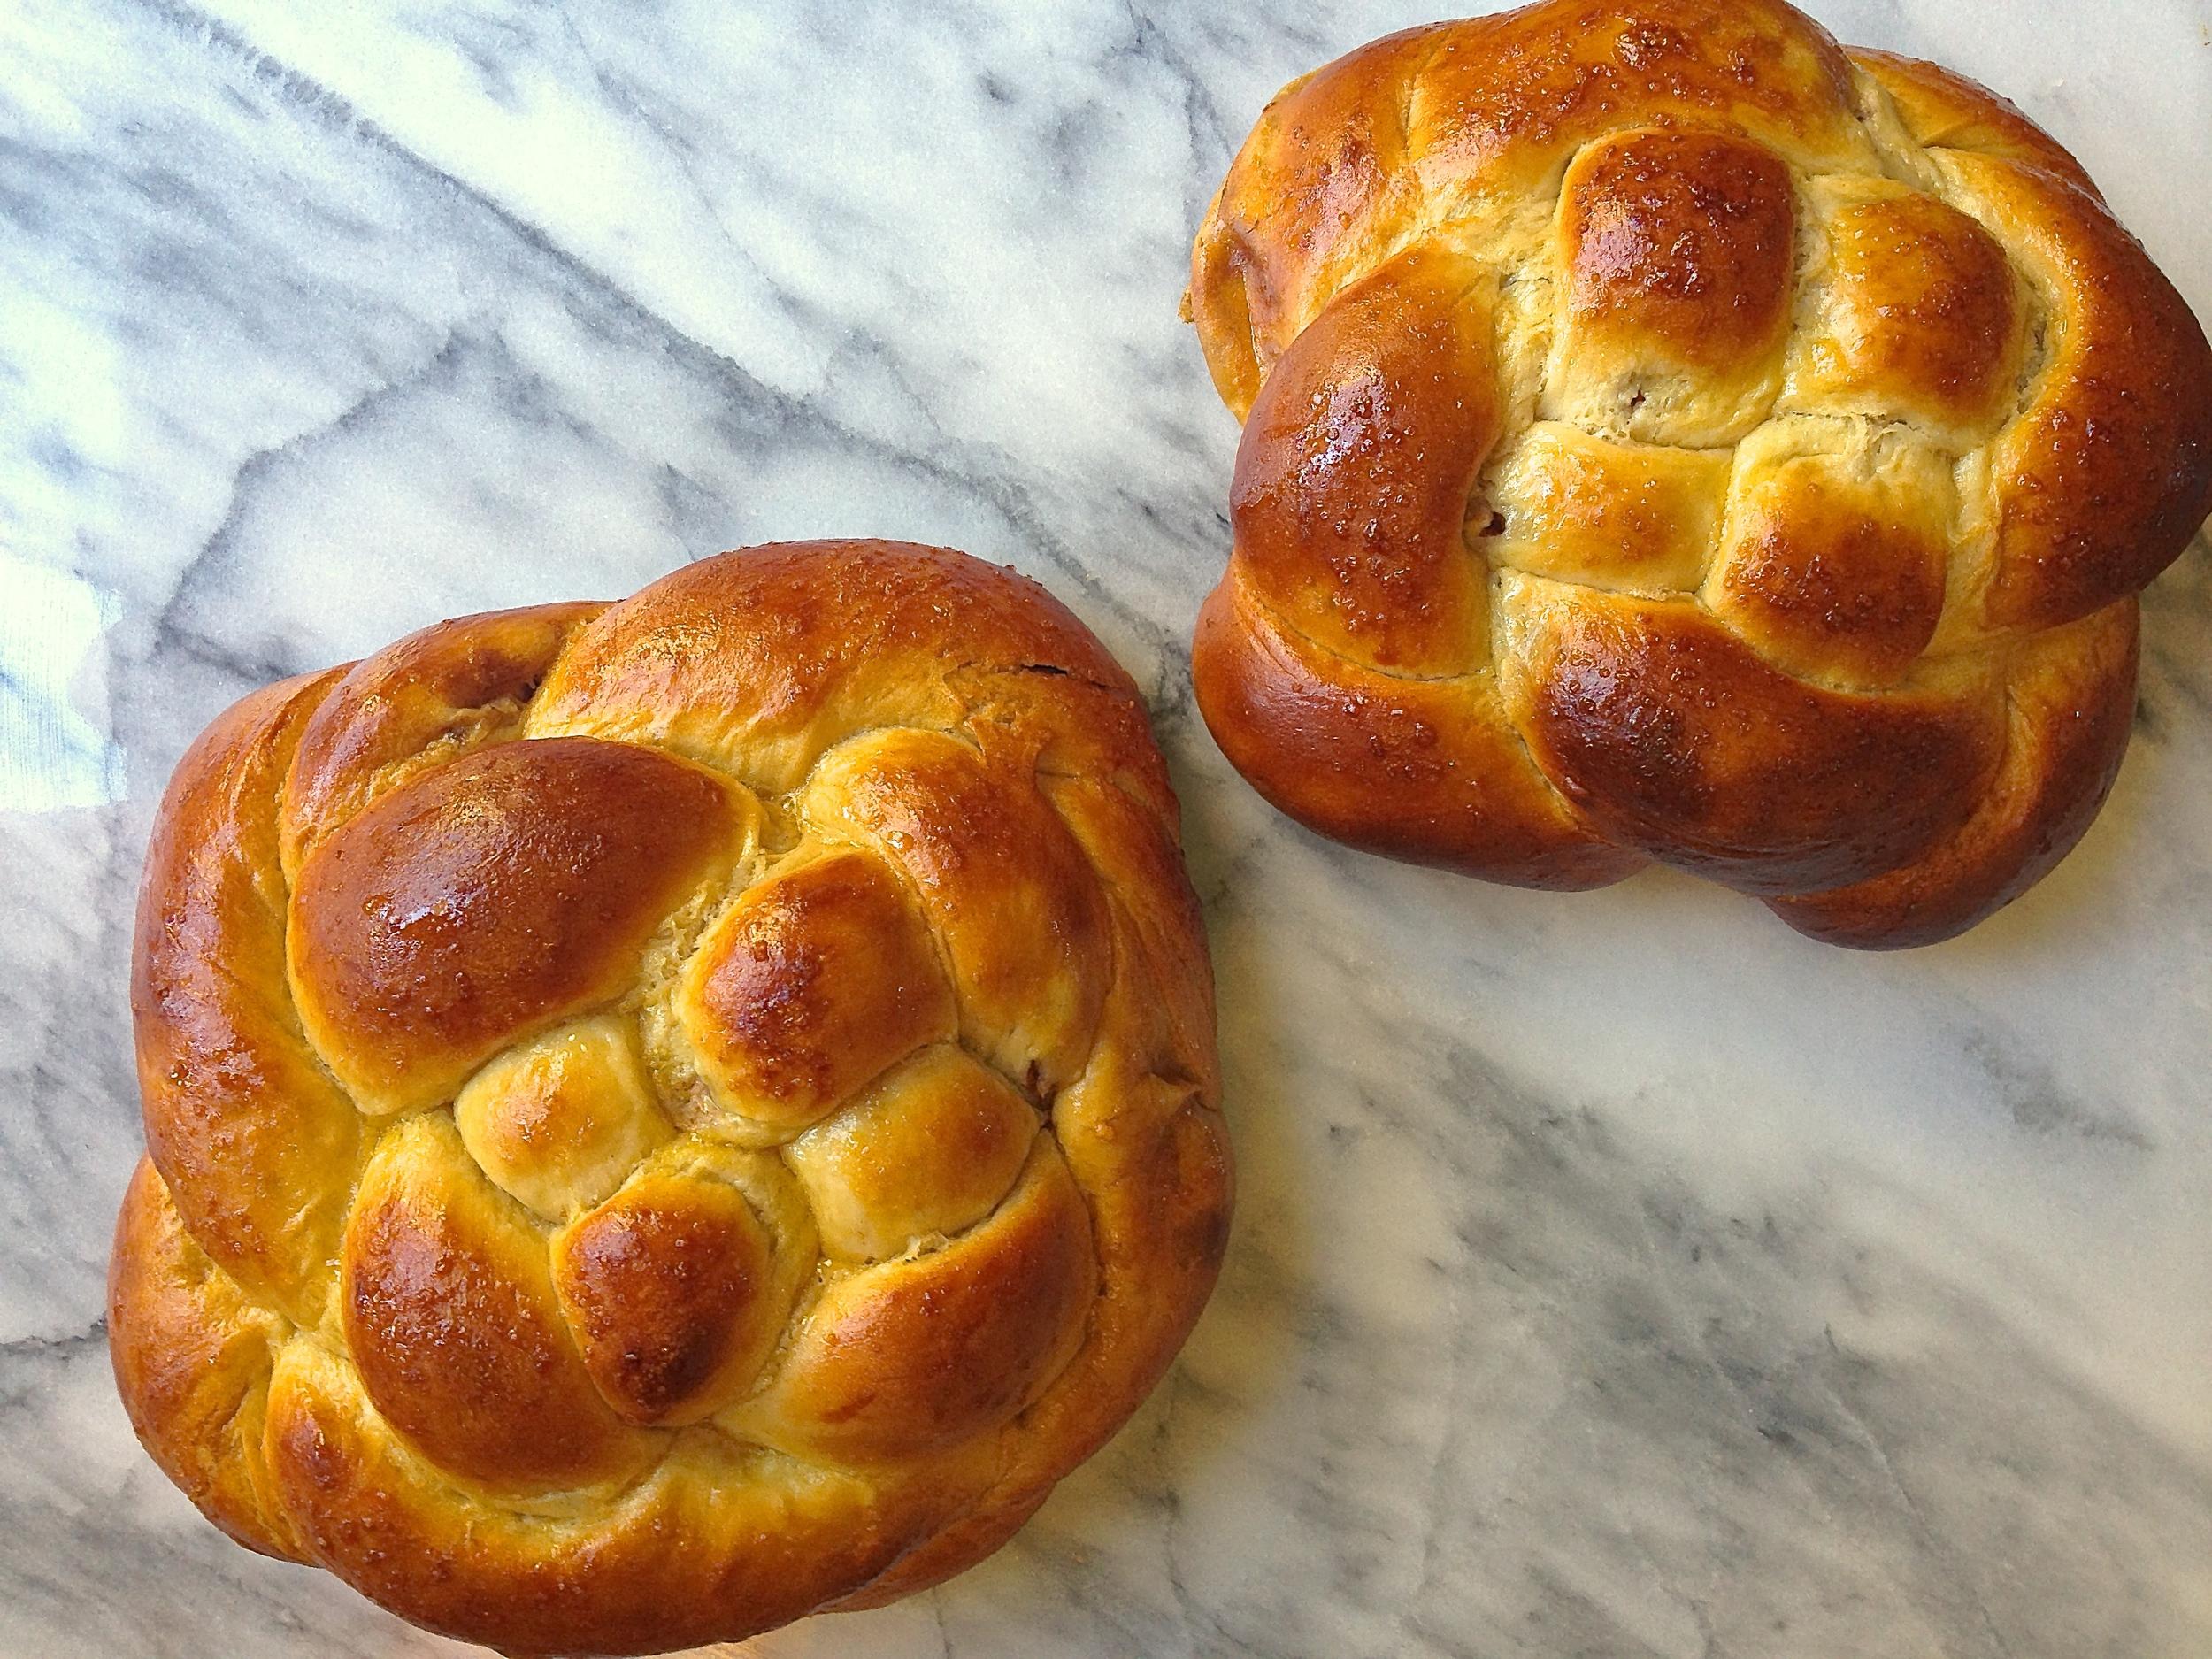 Whole Wheat Cinnamon Apple Challah Bread | Kneading Home